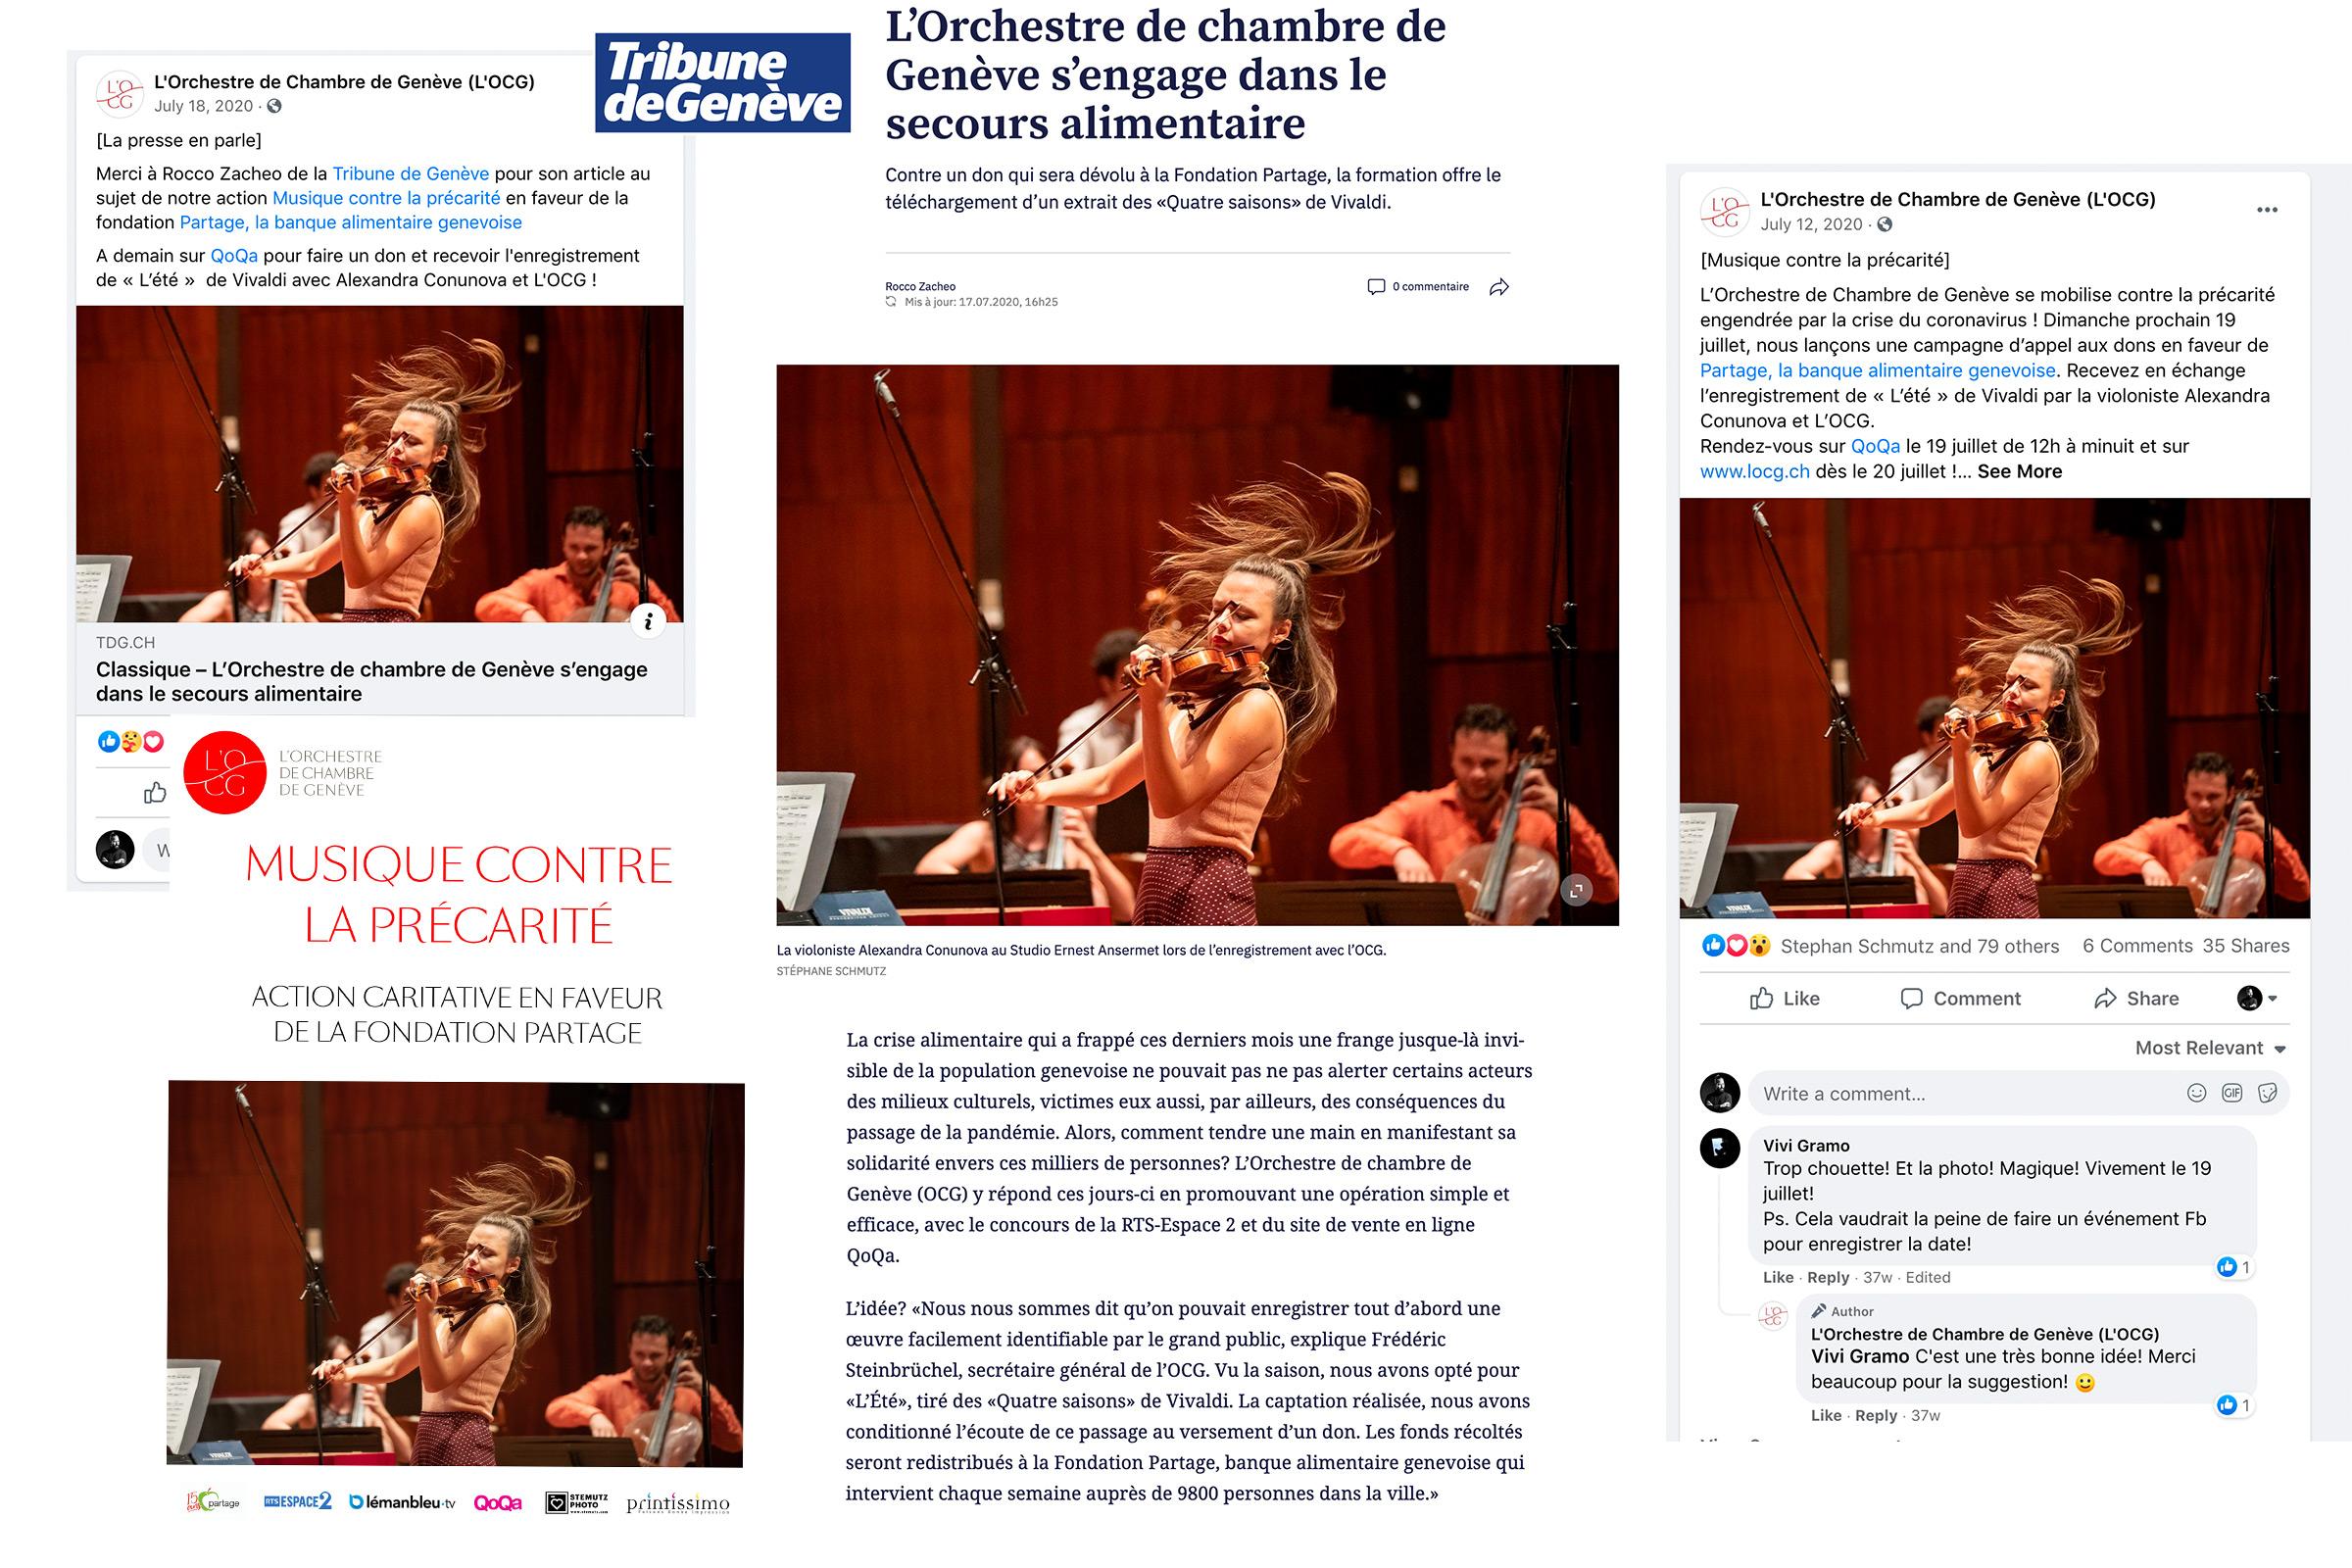 Publications, Presse, Médias sociaux,L'OCG avec Alexandra Conunova by STEMUTZ, Studio Ansermet, 01.07.2020